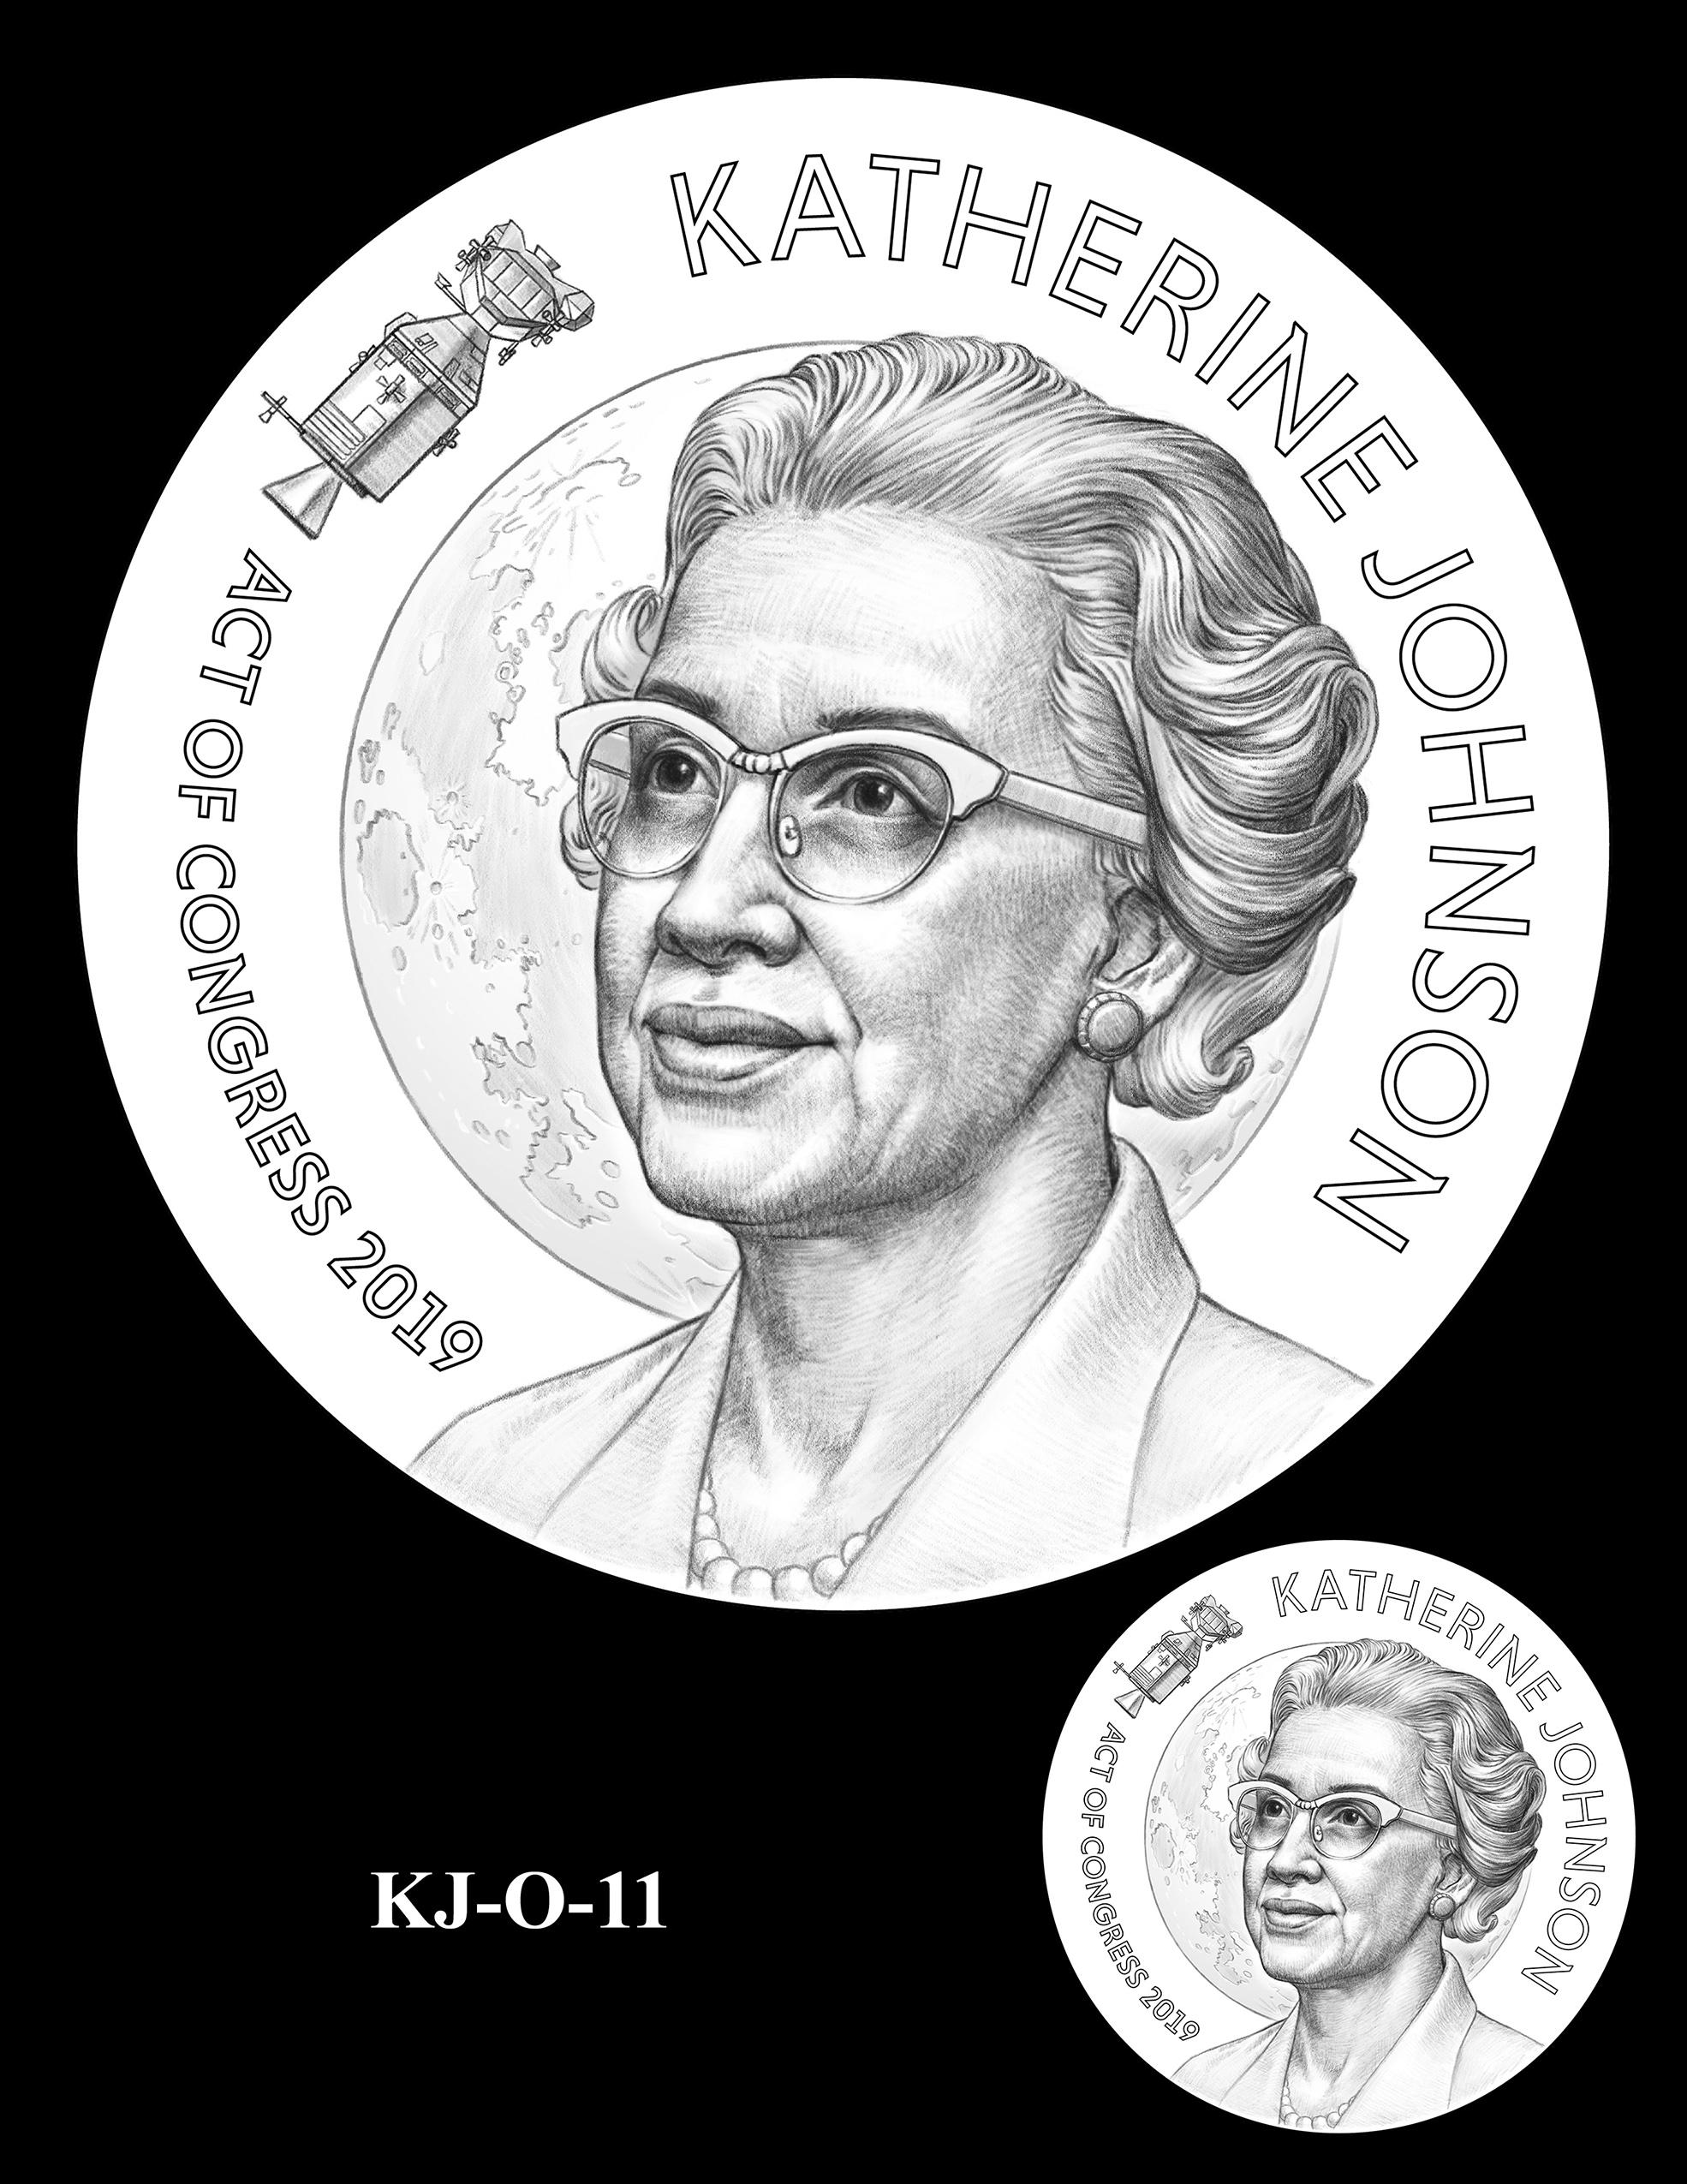 KJ-O-11 -- Katherine Johnson Congressional Gold Medal